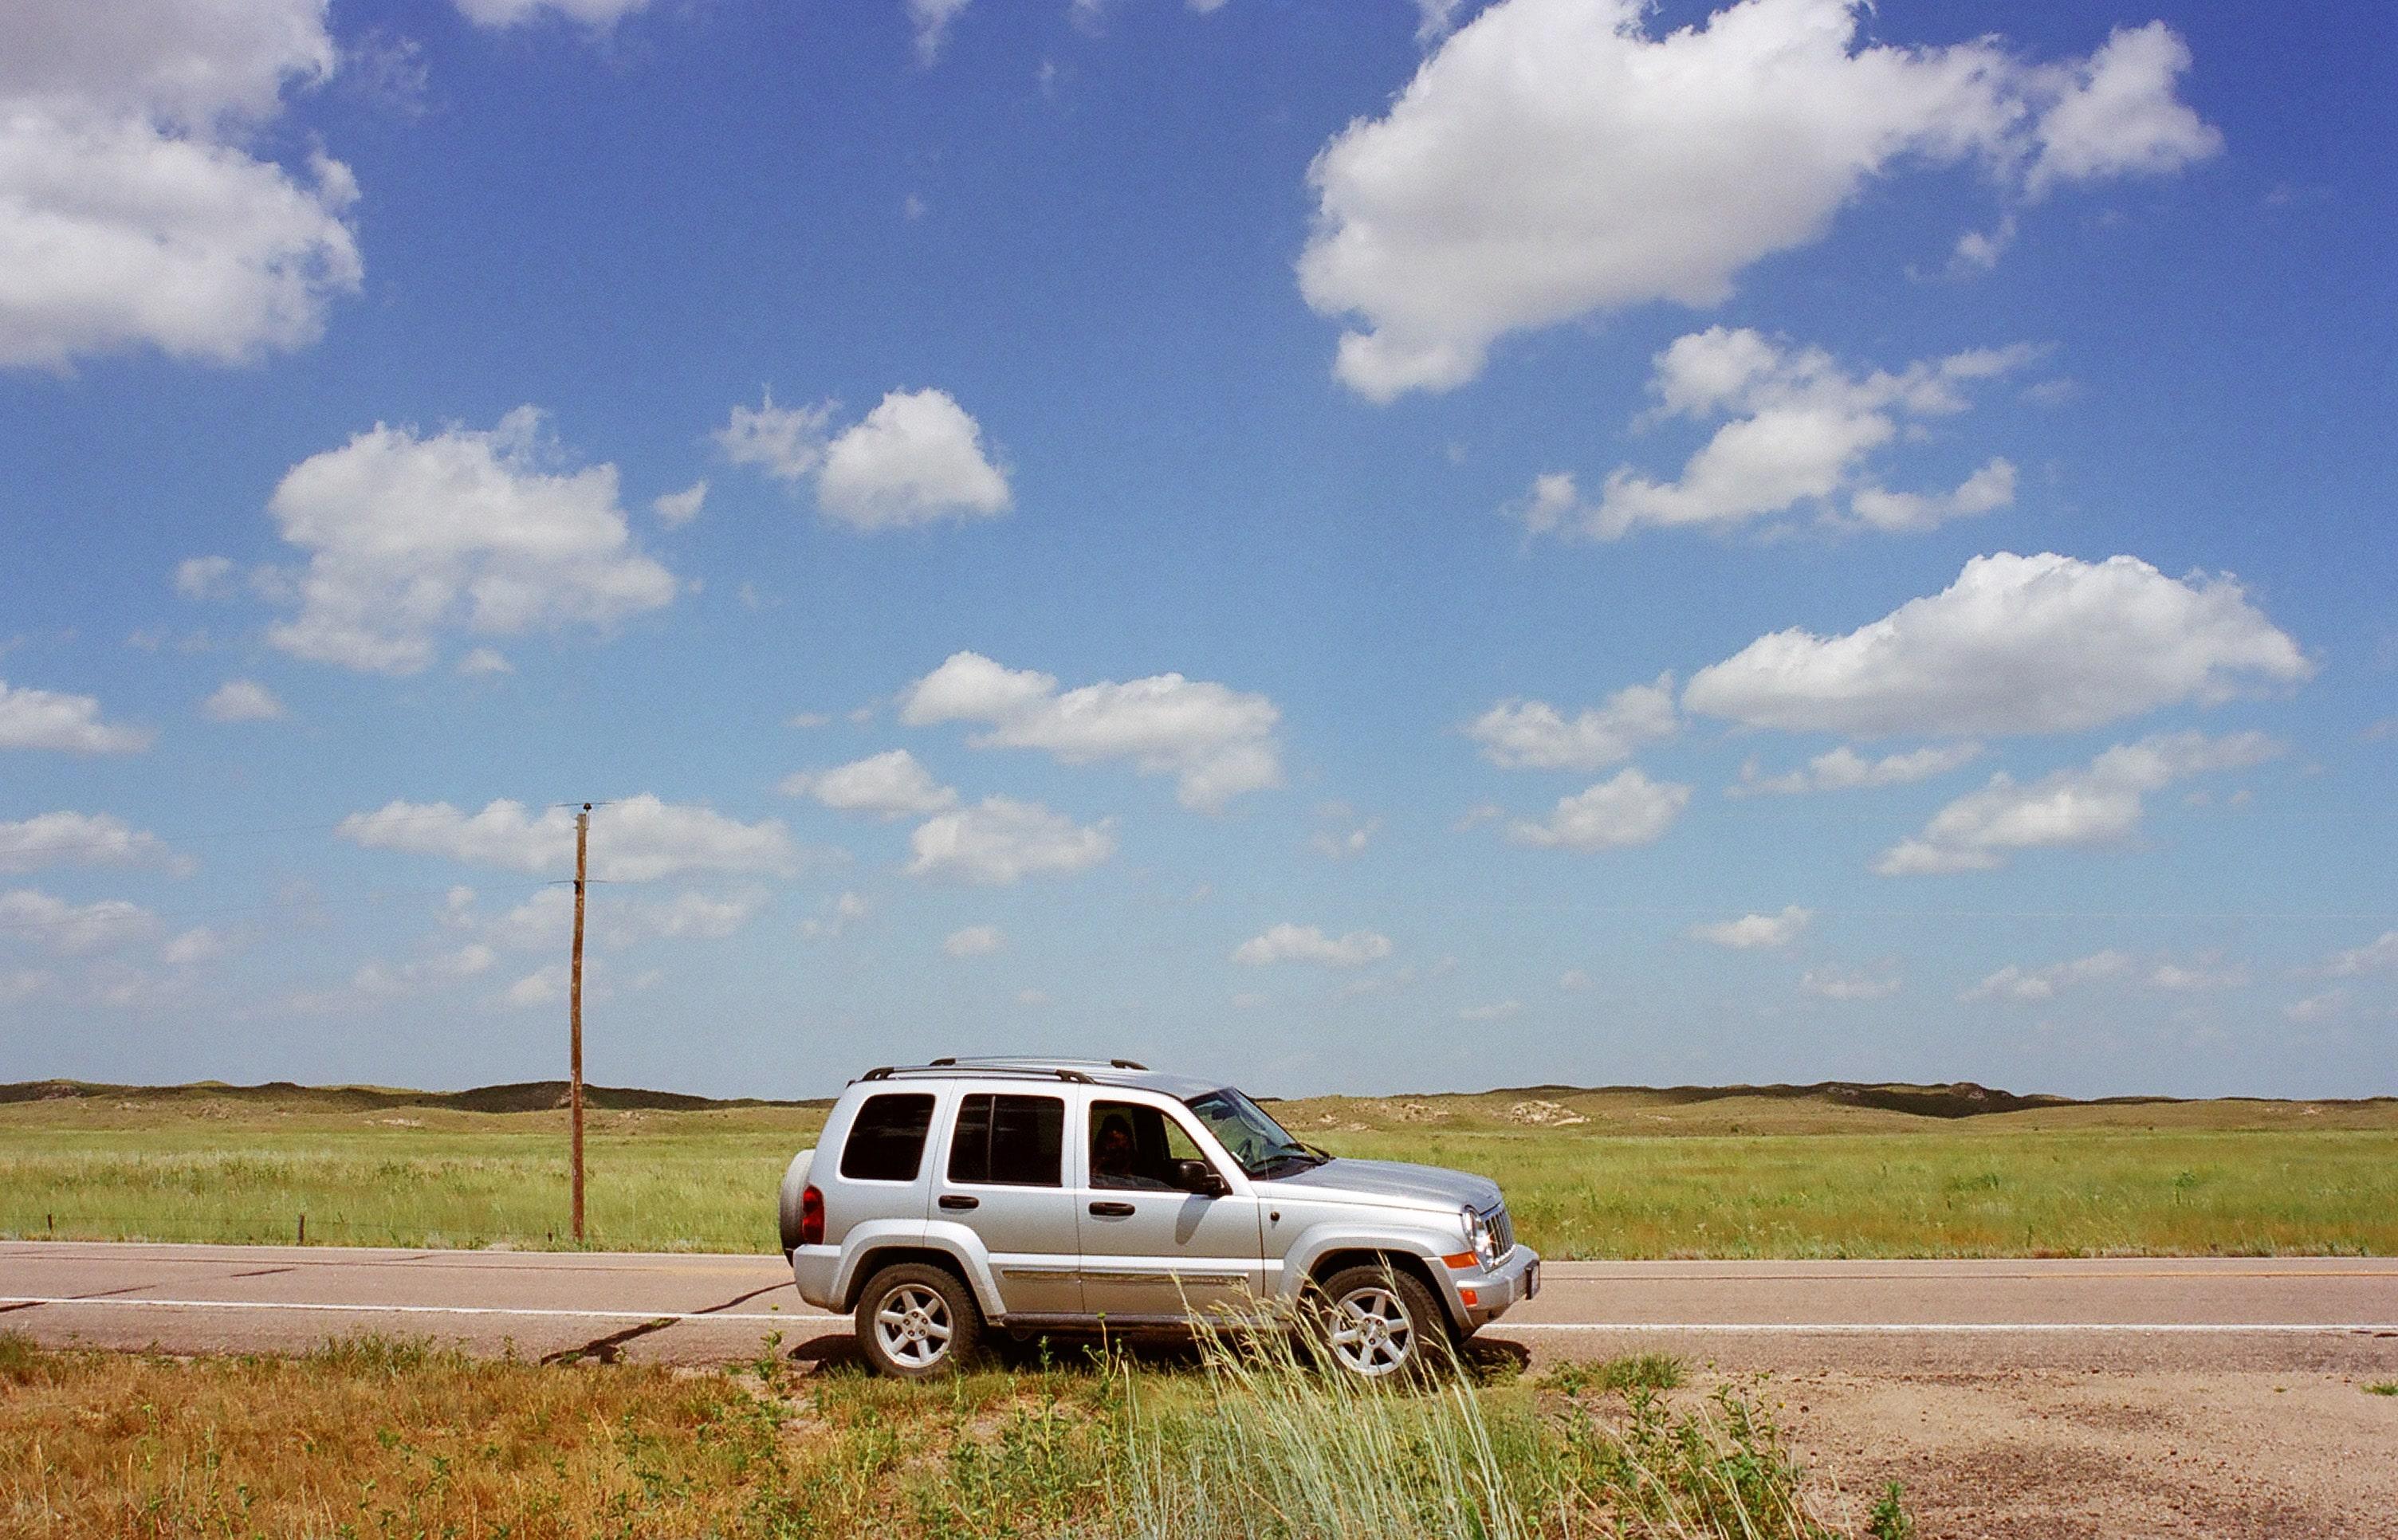 06-On-the-road.jpg